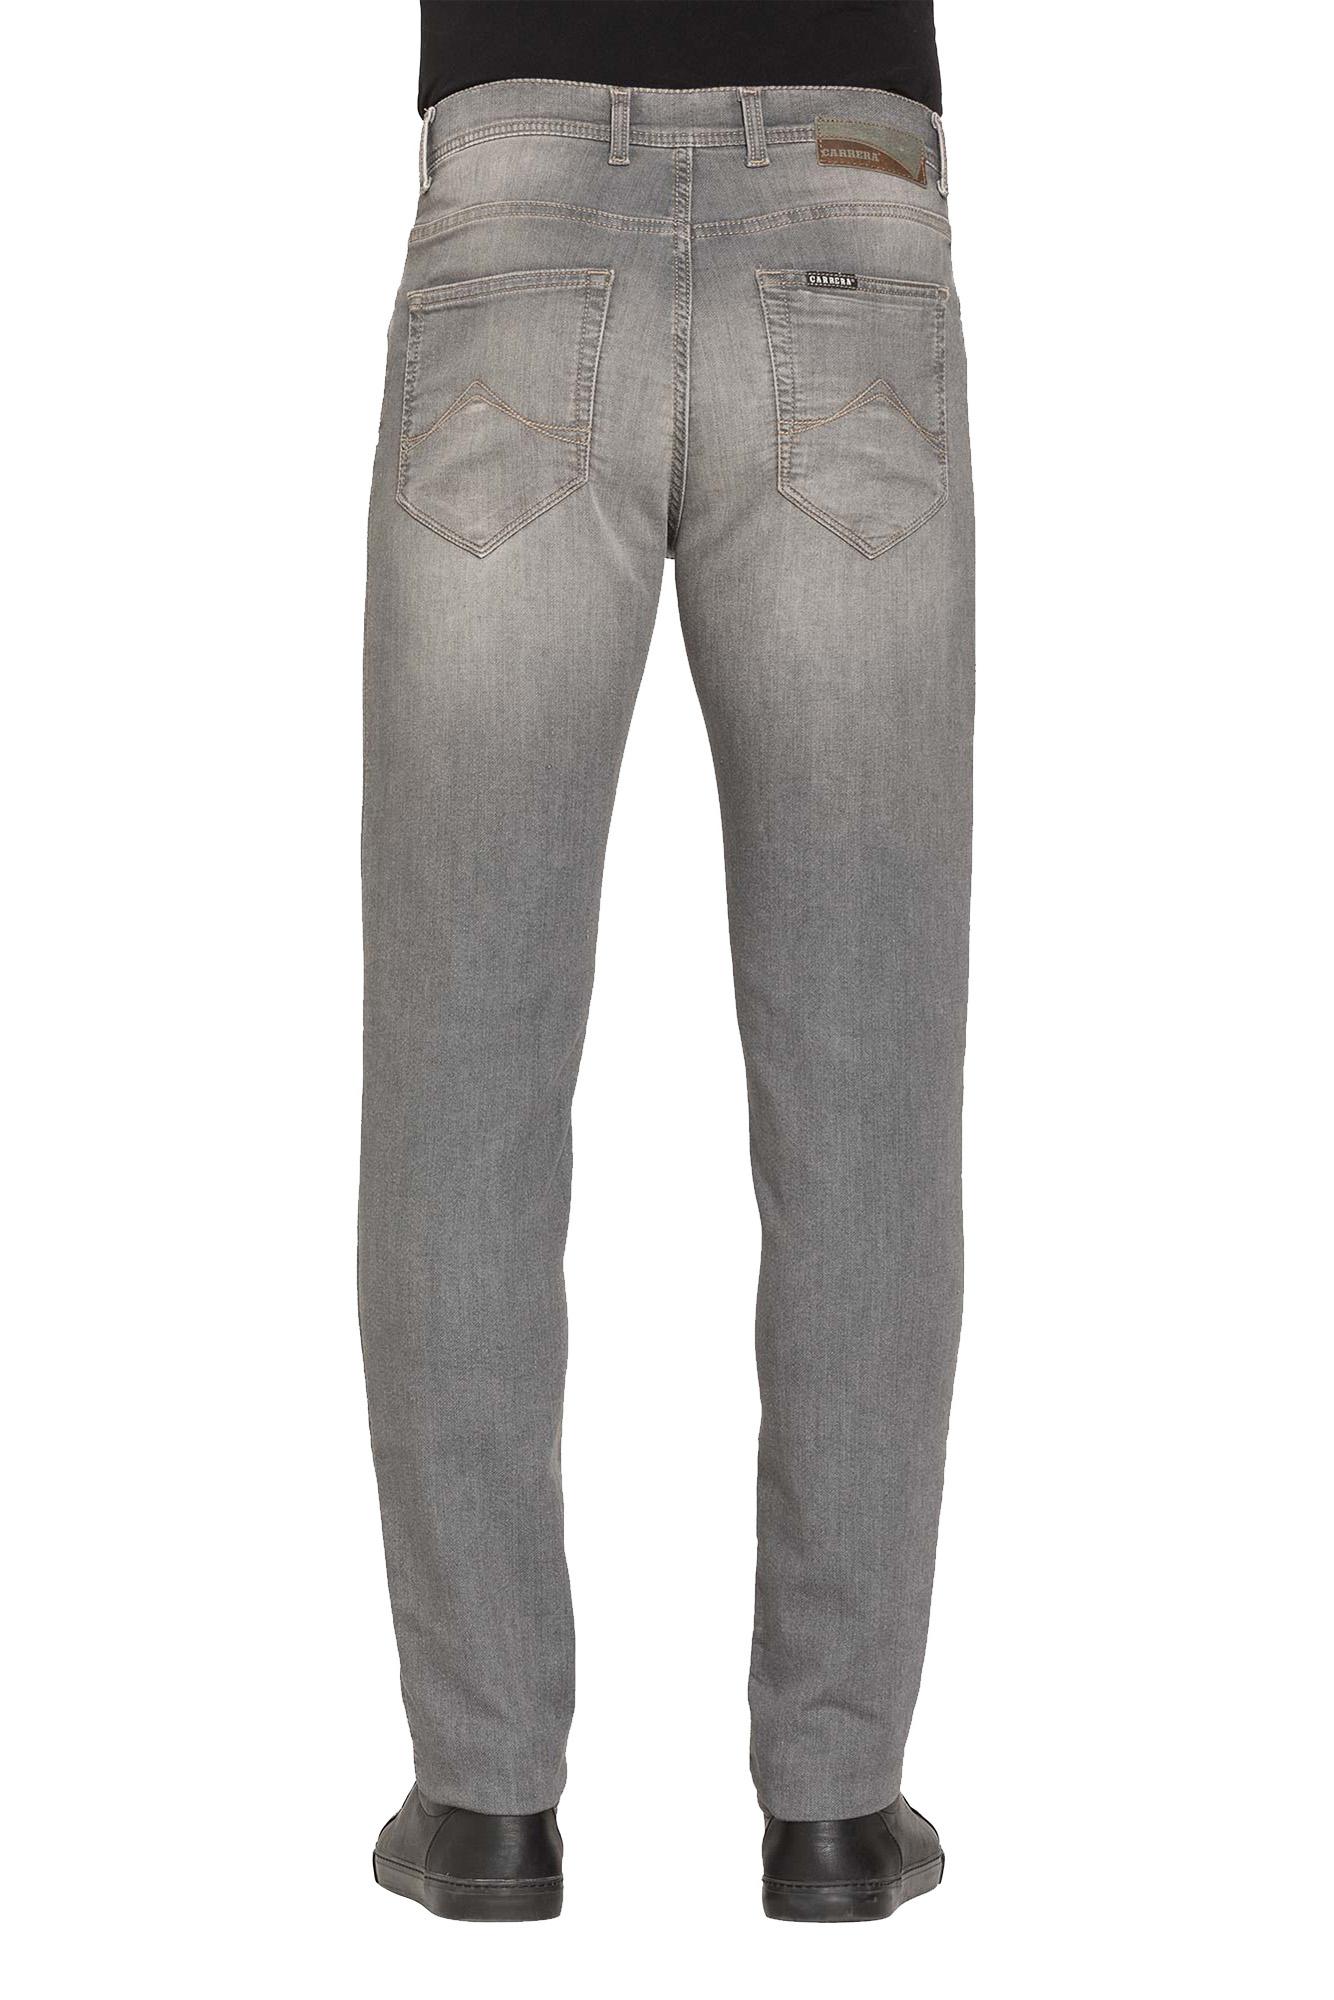 Carrera-Jeans-Jeans-per-uomo-tinta-unita miniatura 18